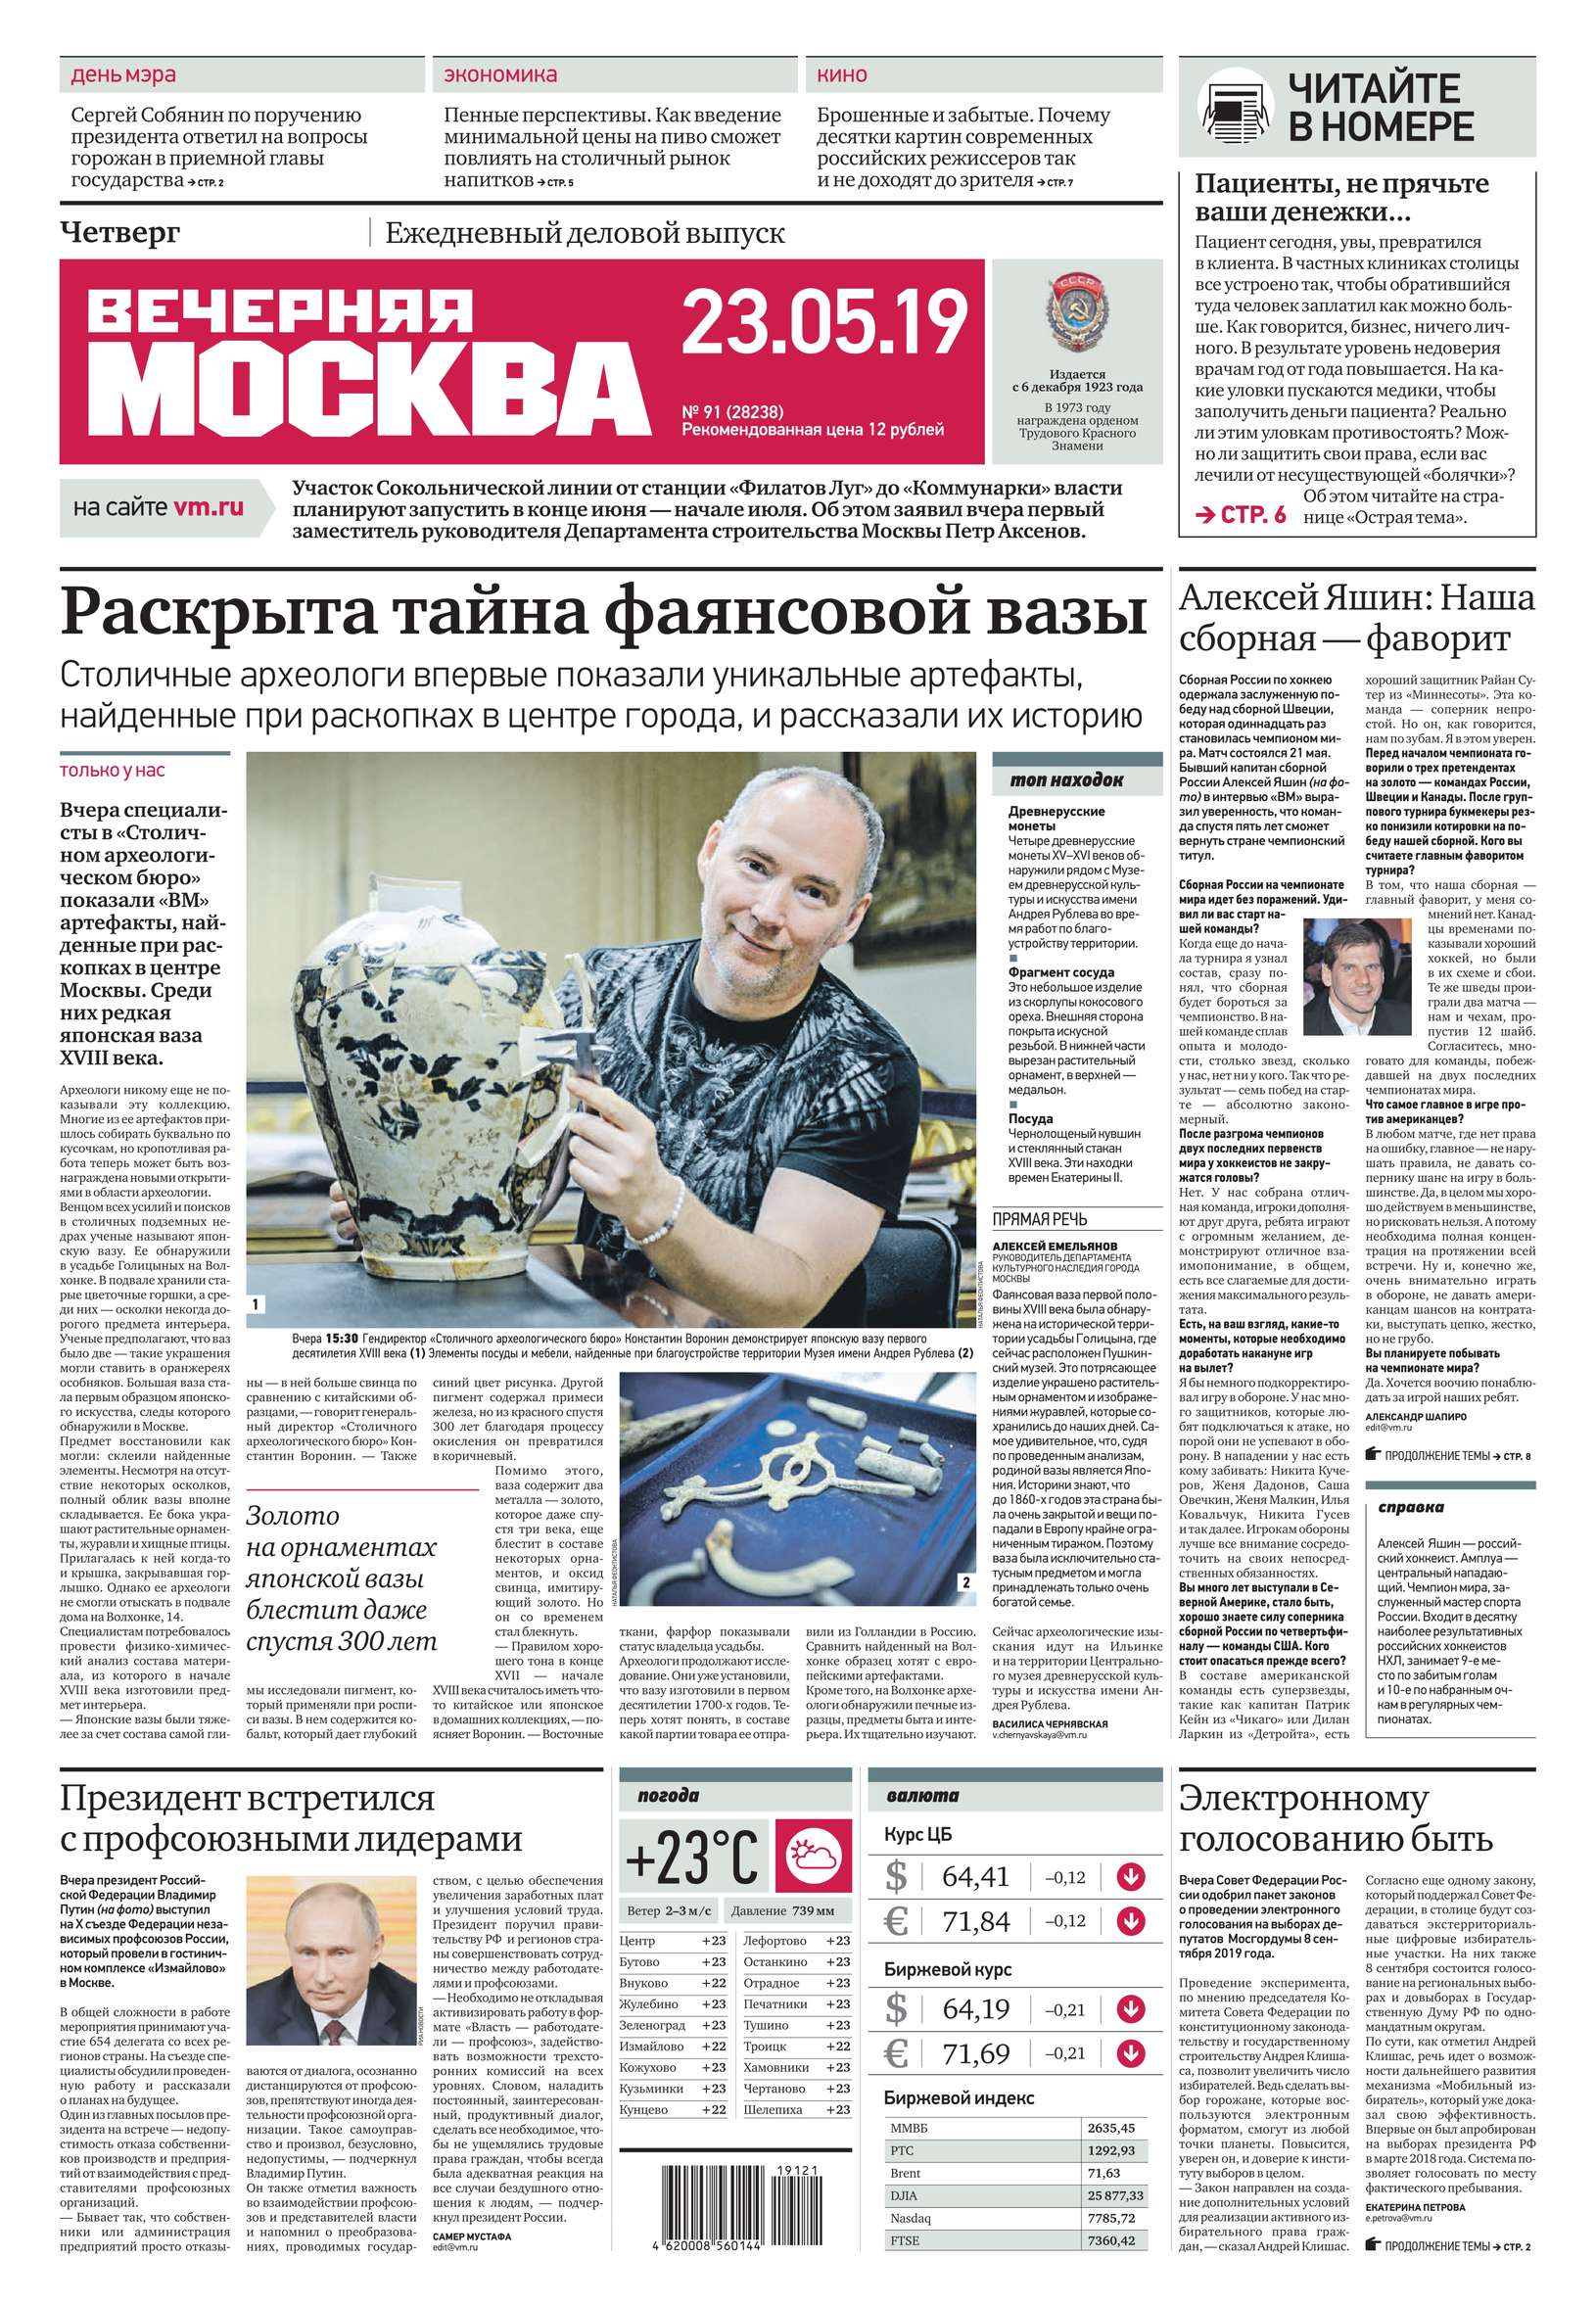 Редакция газеты Вечерняя Москва Вечерняя Москва 91-2019